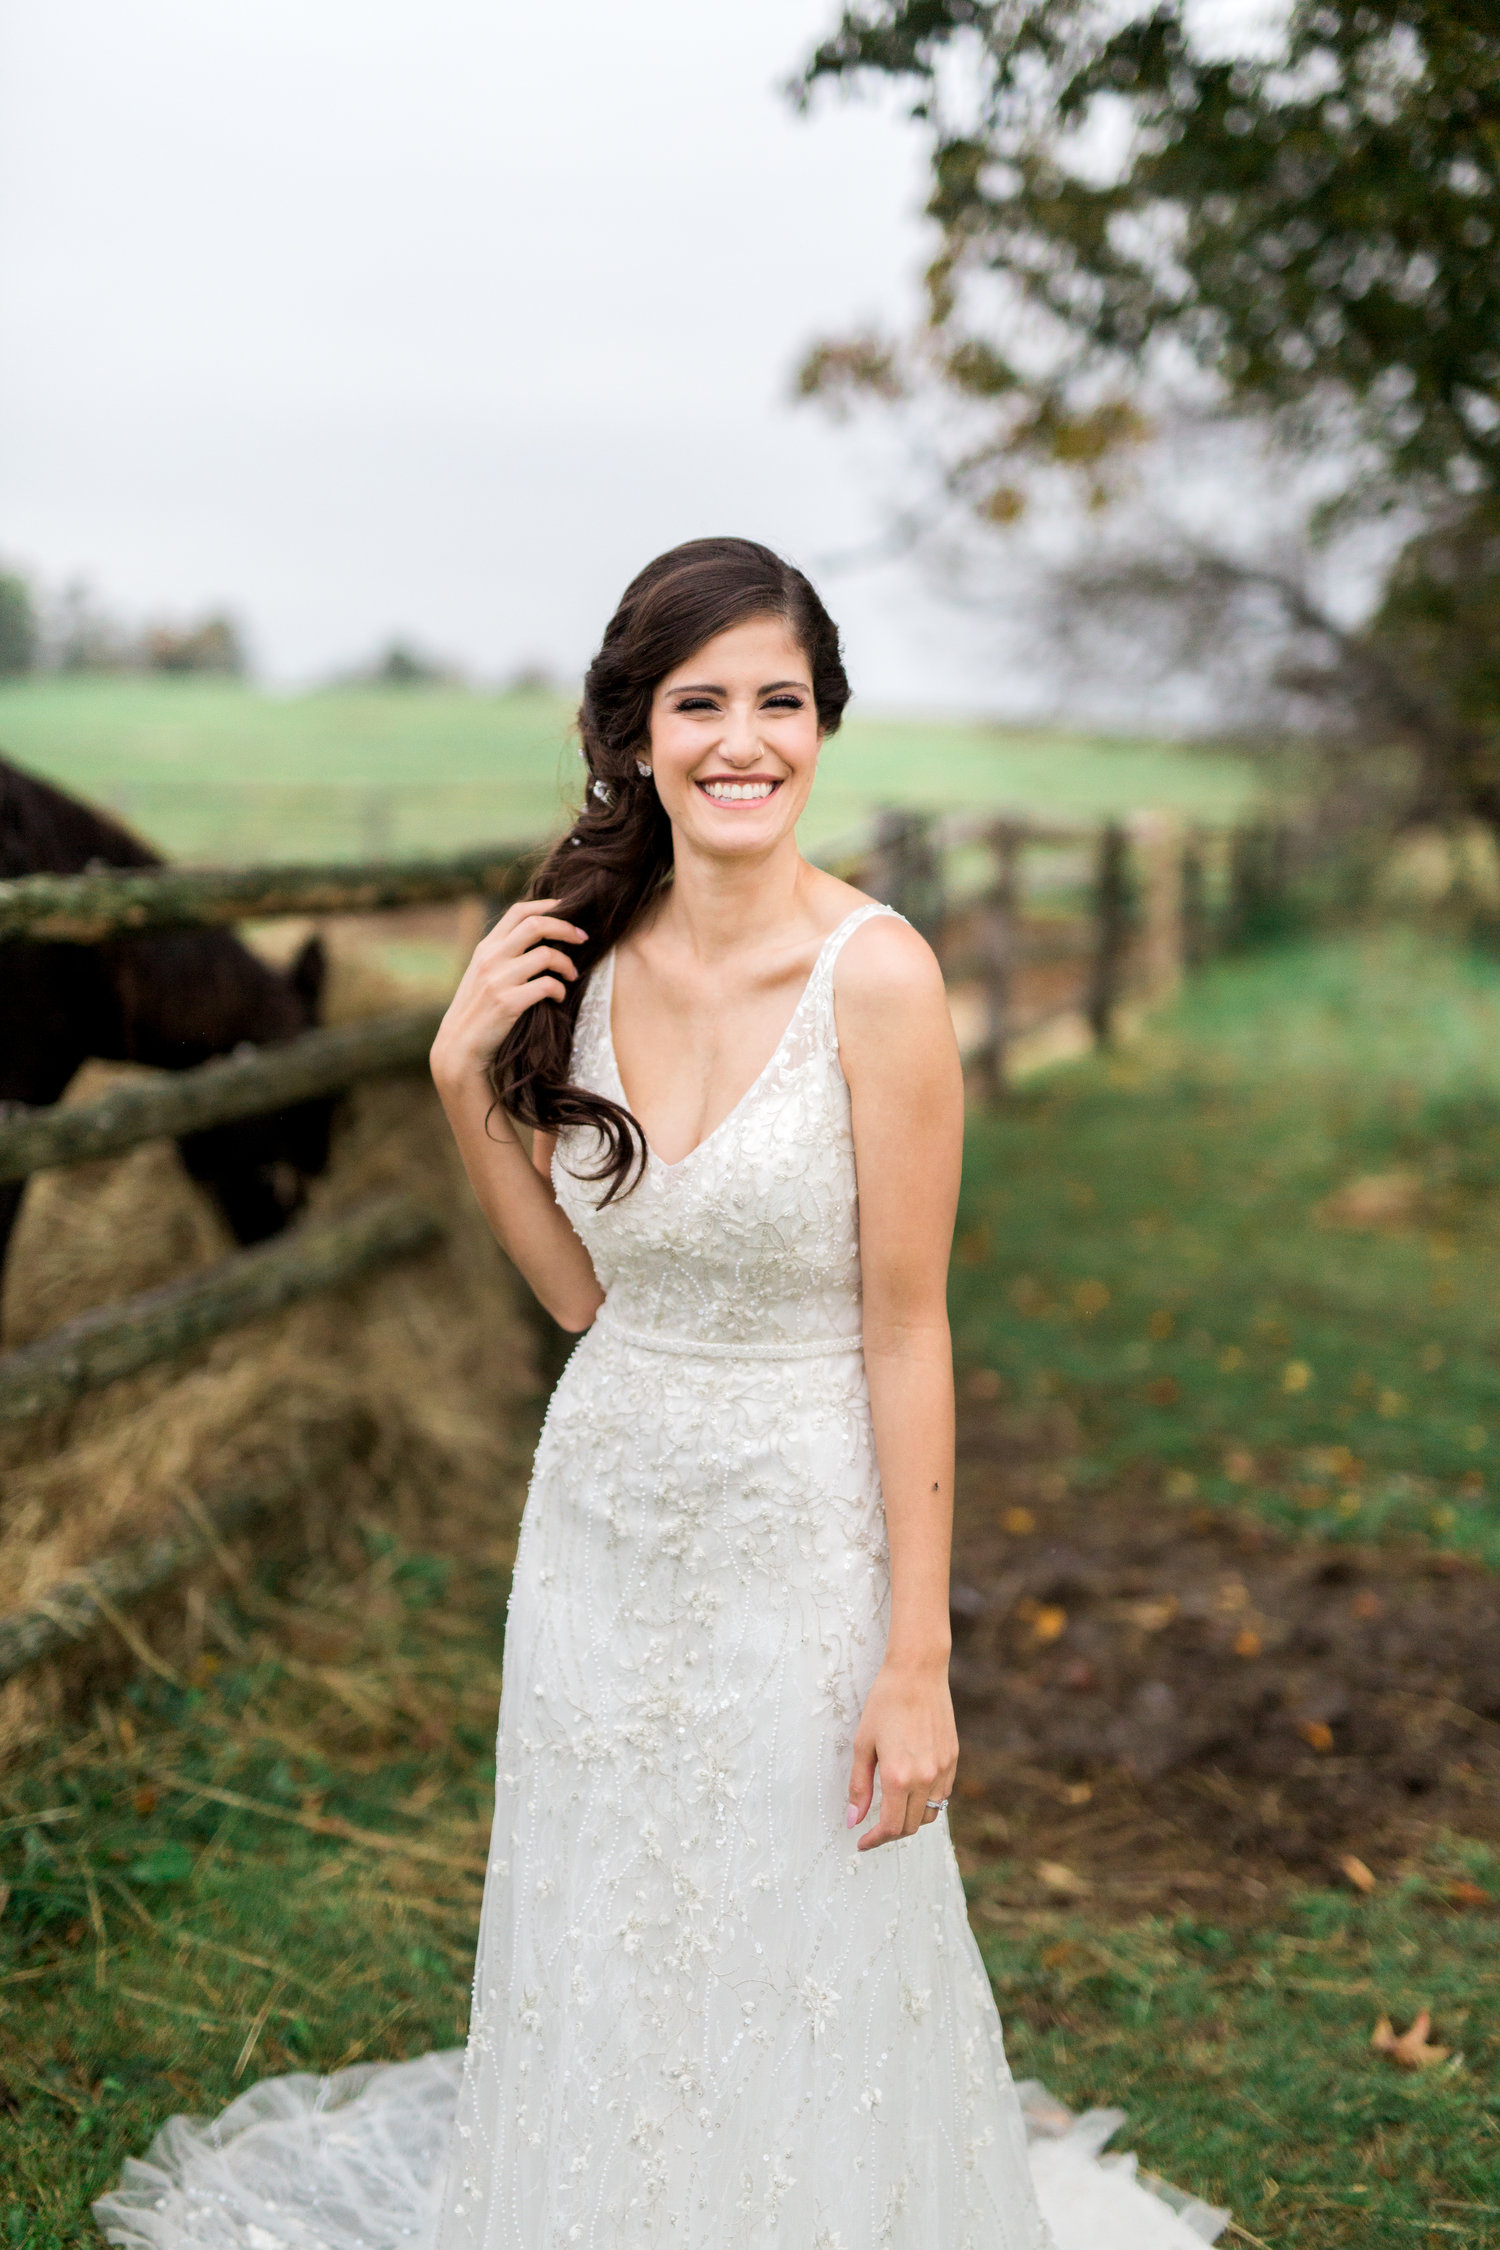 Amir-Golbazi-Danielle-Giroux-Photography_Toronto-Wedding_Cedarwood_Rachel-Paul_529.jpg